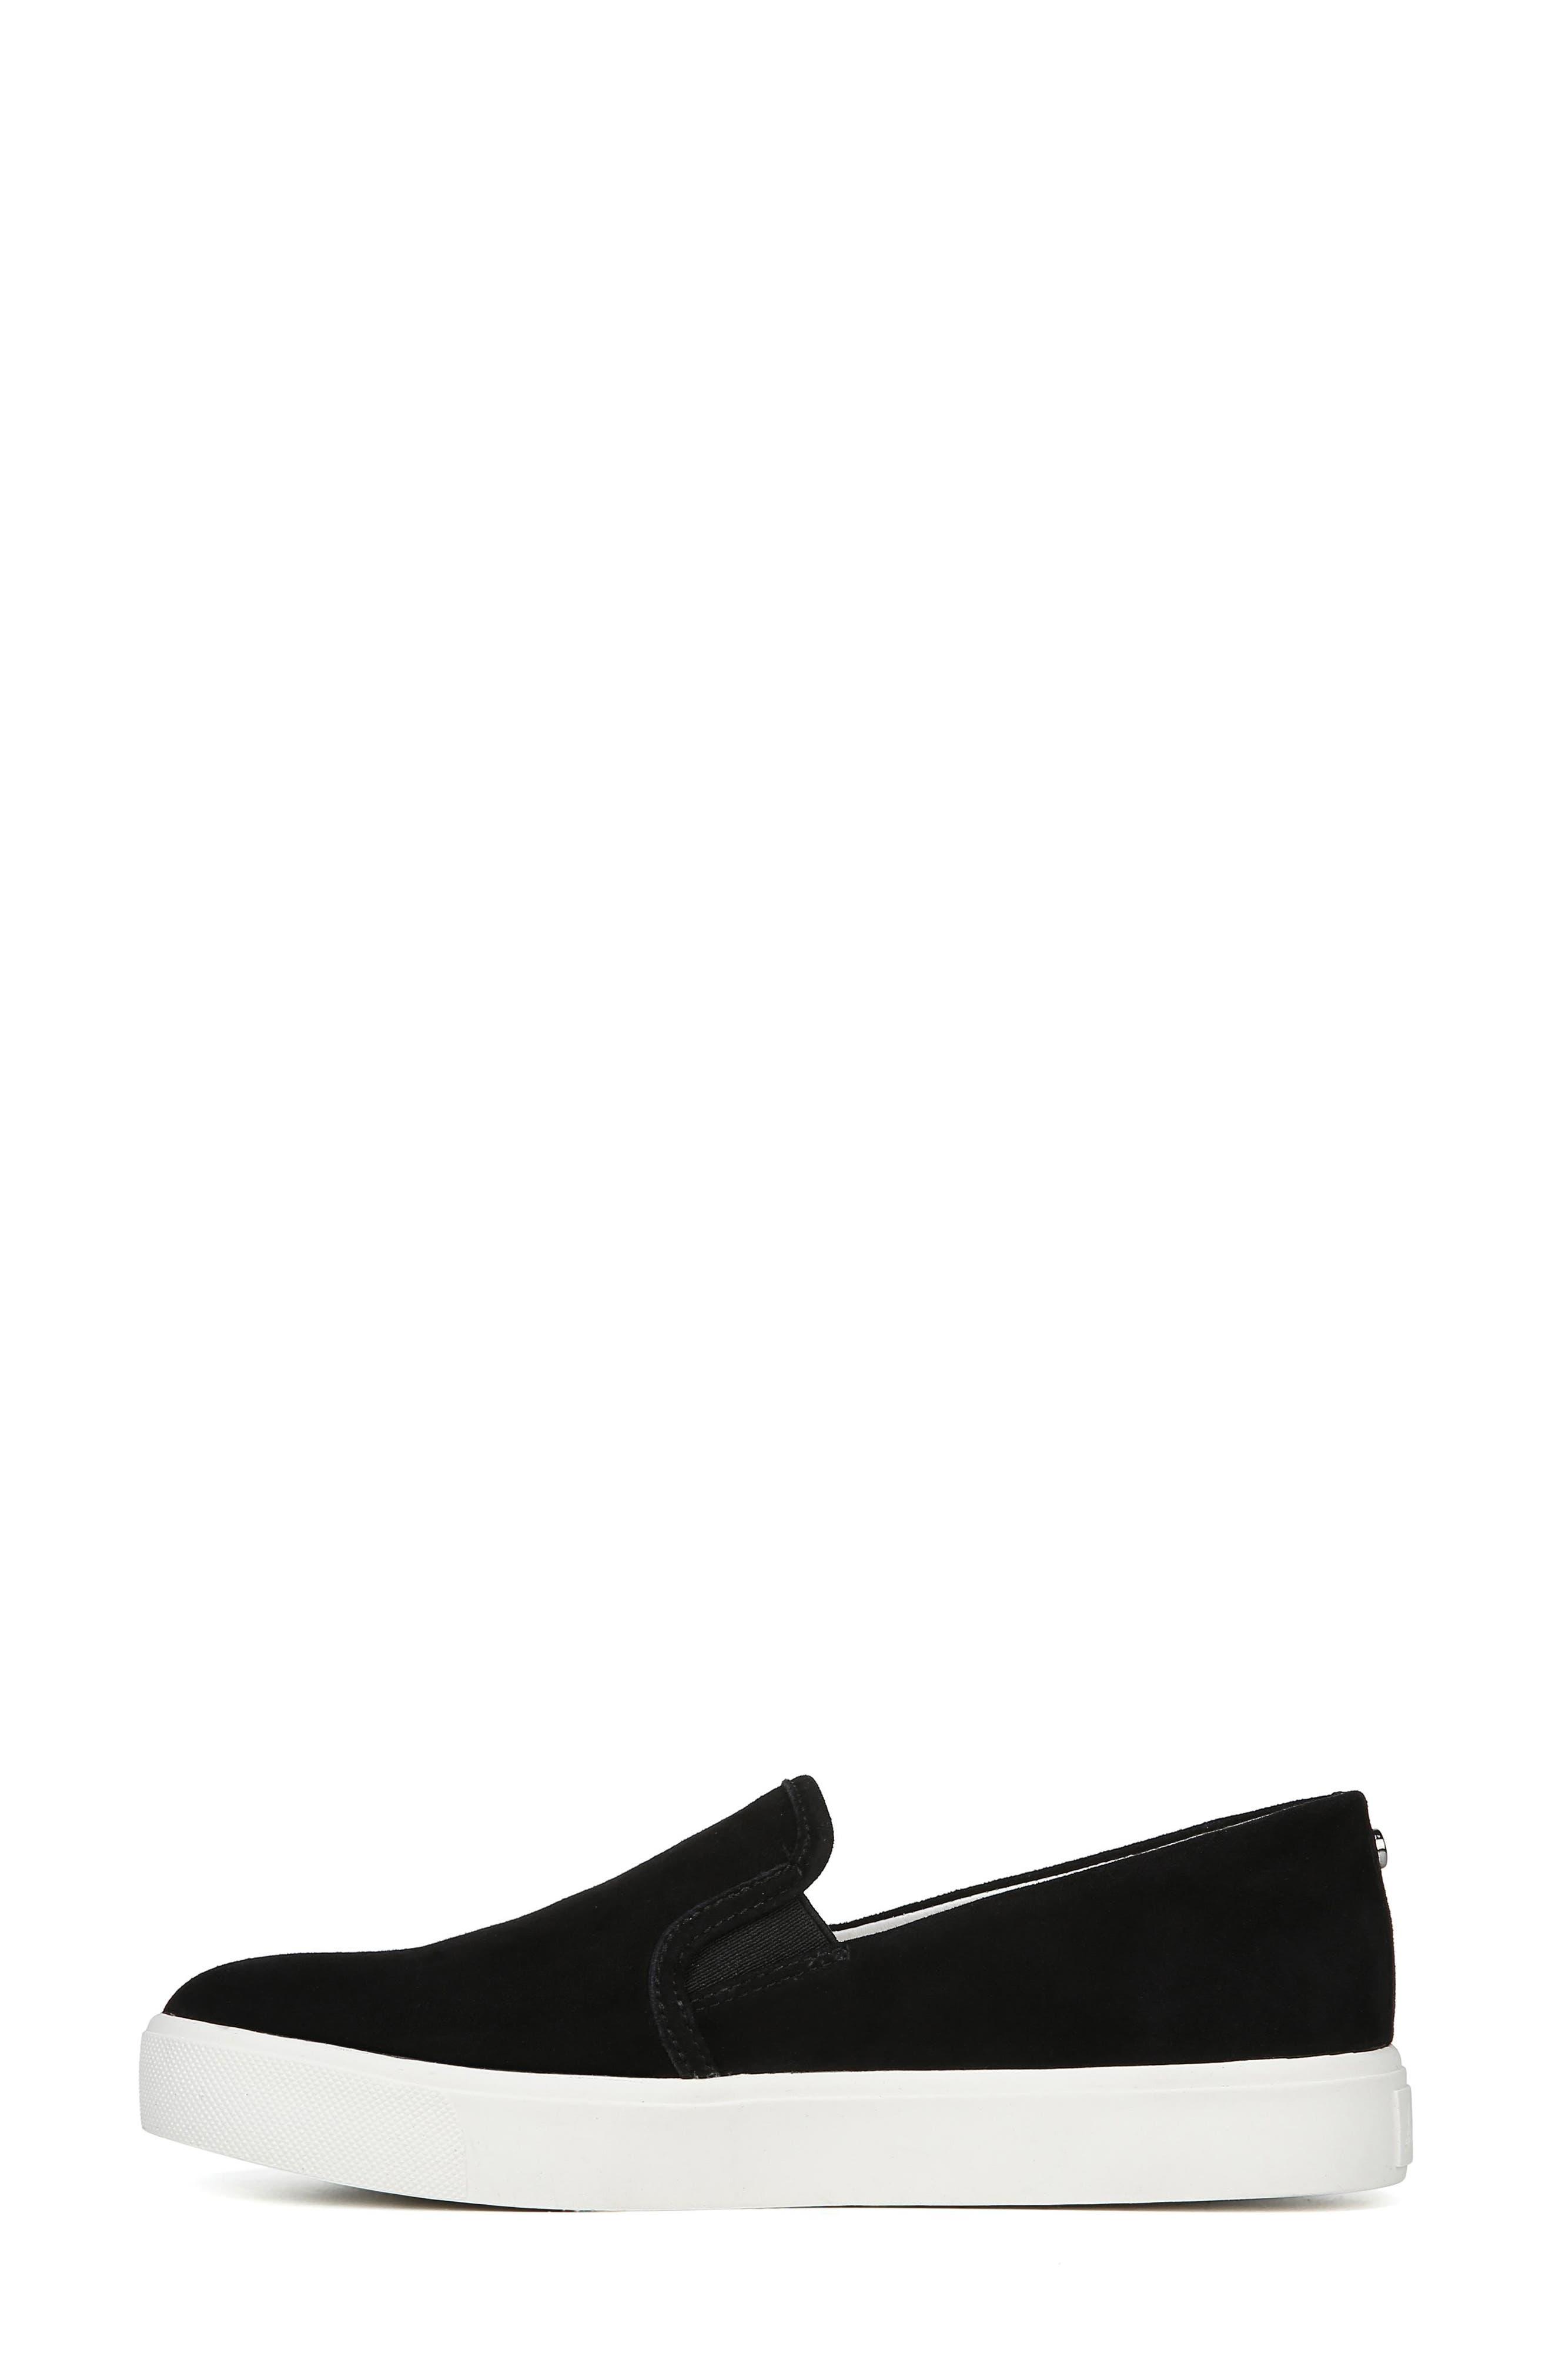 Elton Slip-On Sneaker,                             Alternate thumbnail 8, color,                             BLACK SUEDE LEATHER